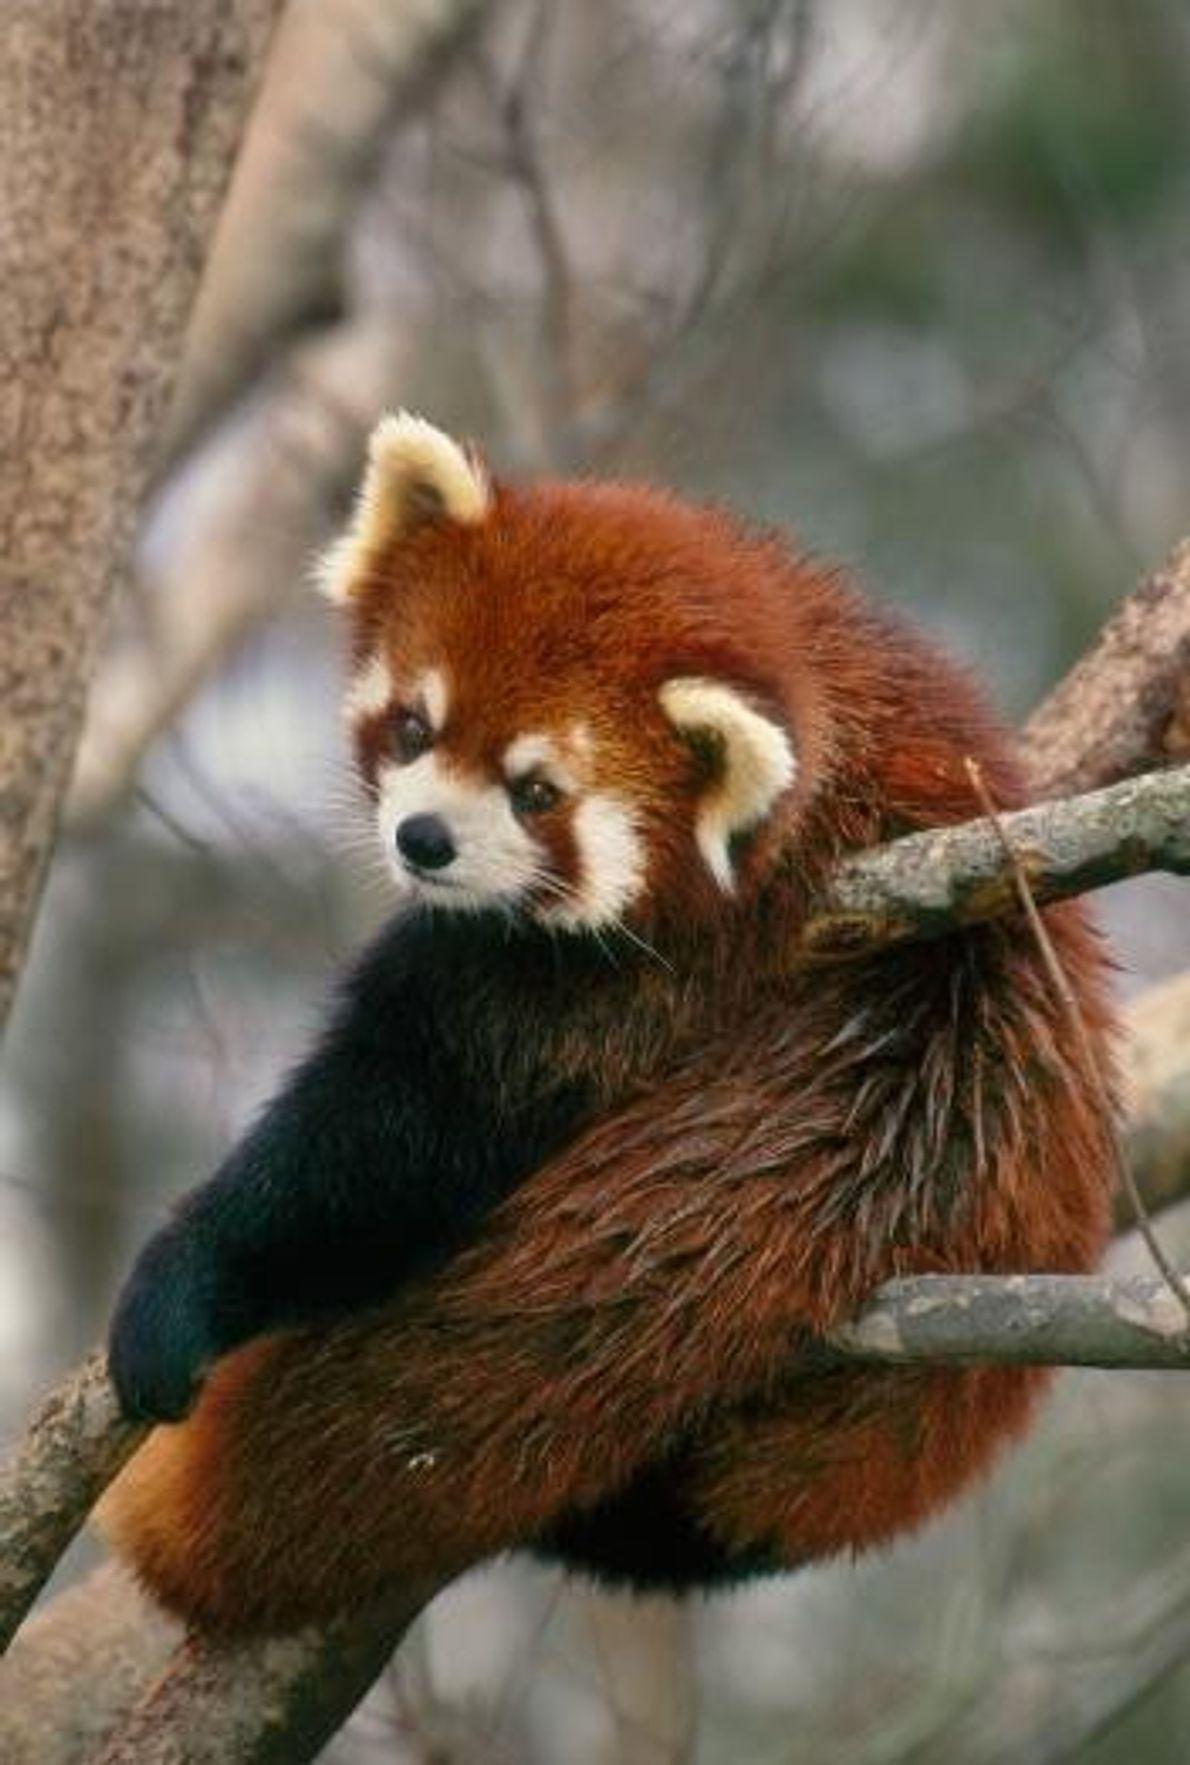 Pandapause